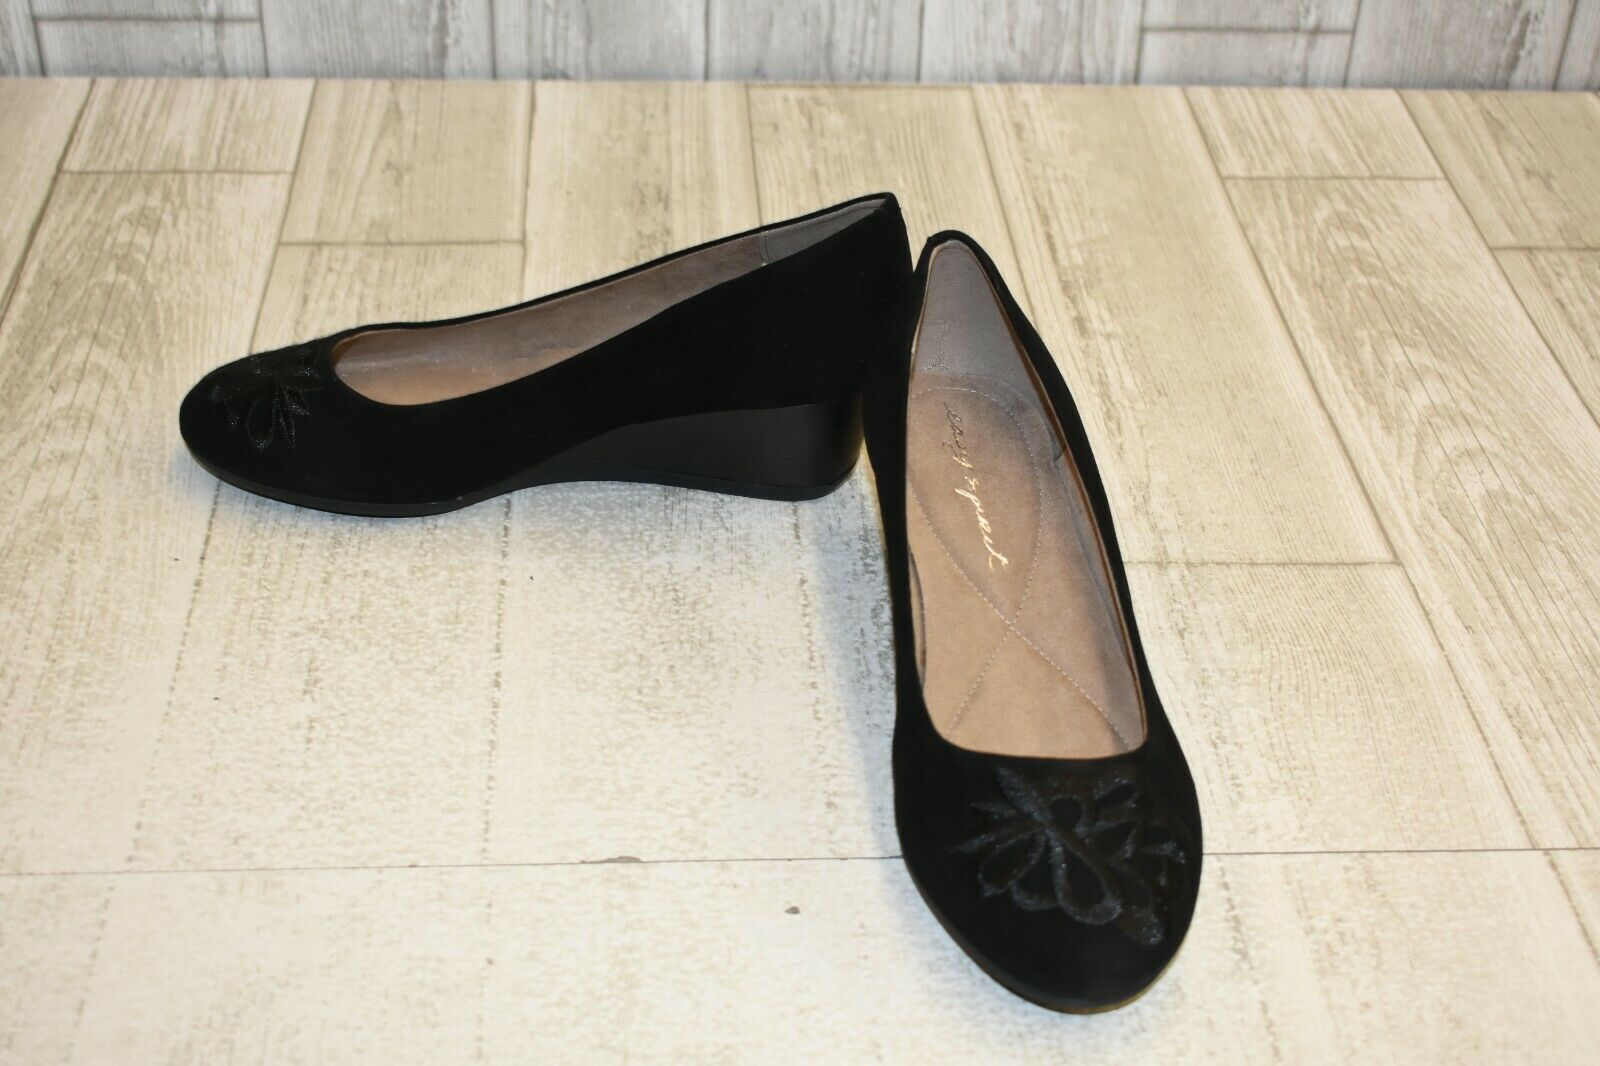 Easy Spirit Larcie Wedge Pump - Women's Size 7.5WW, Black